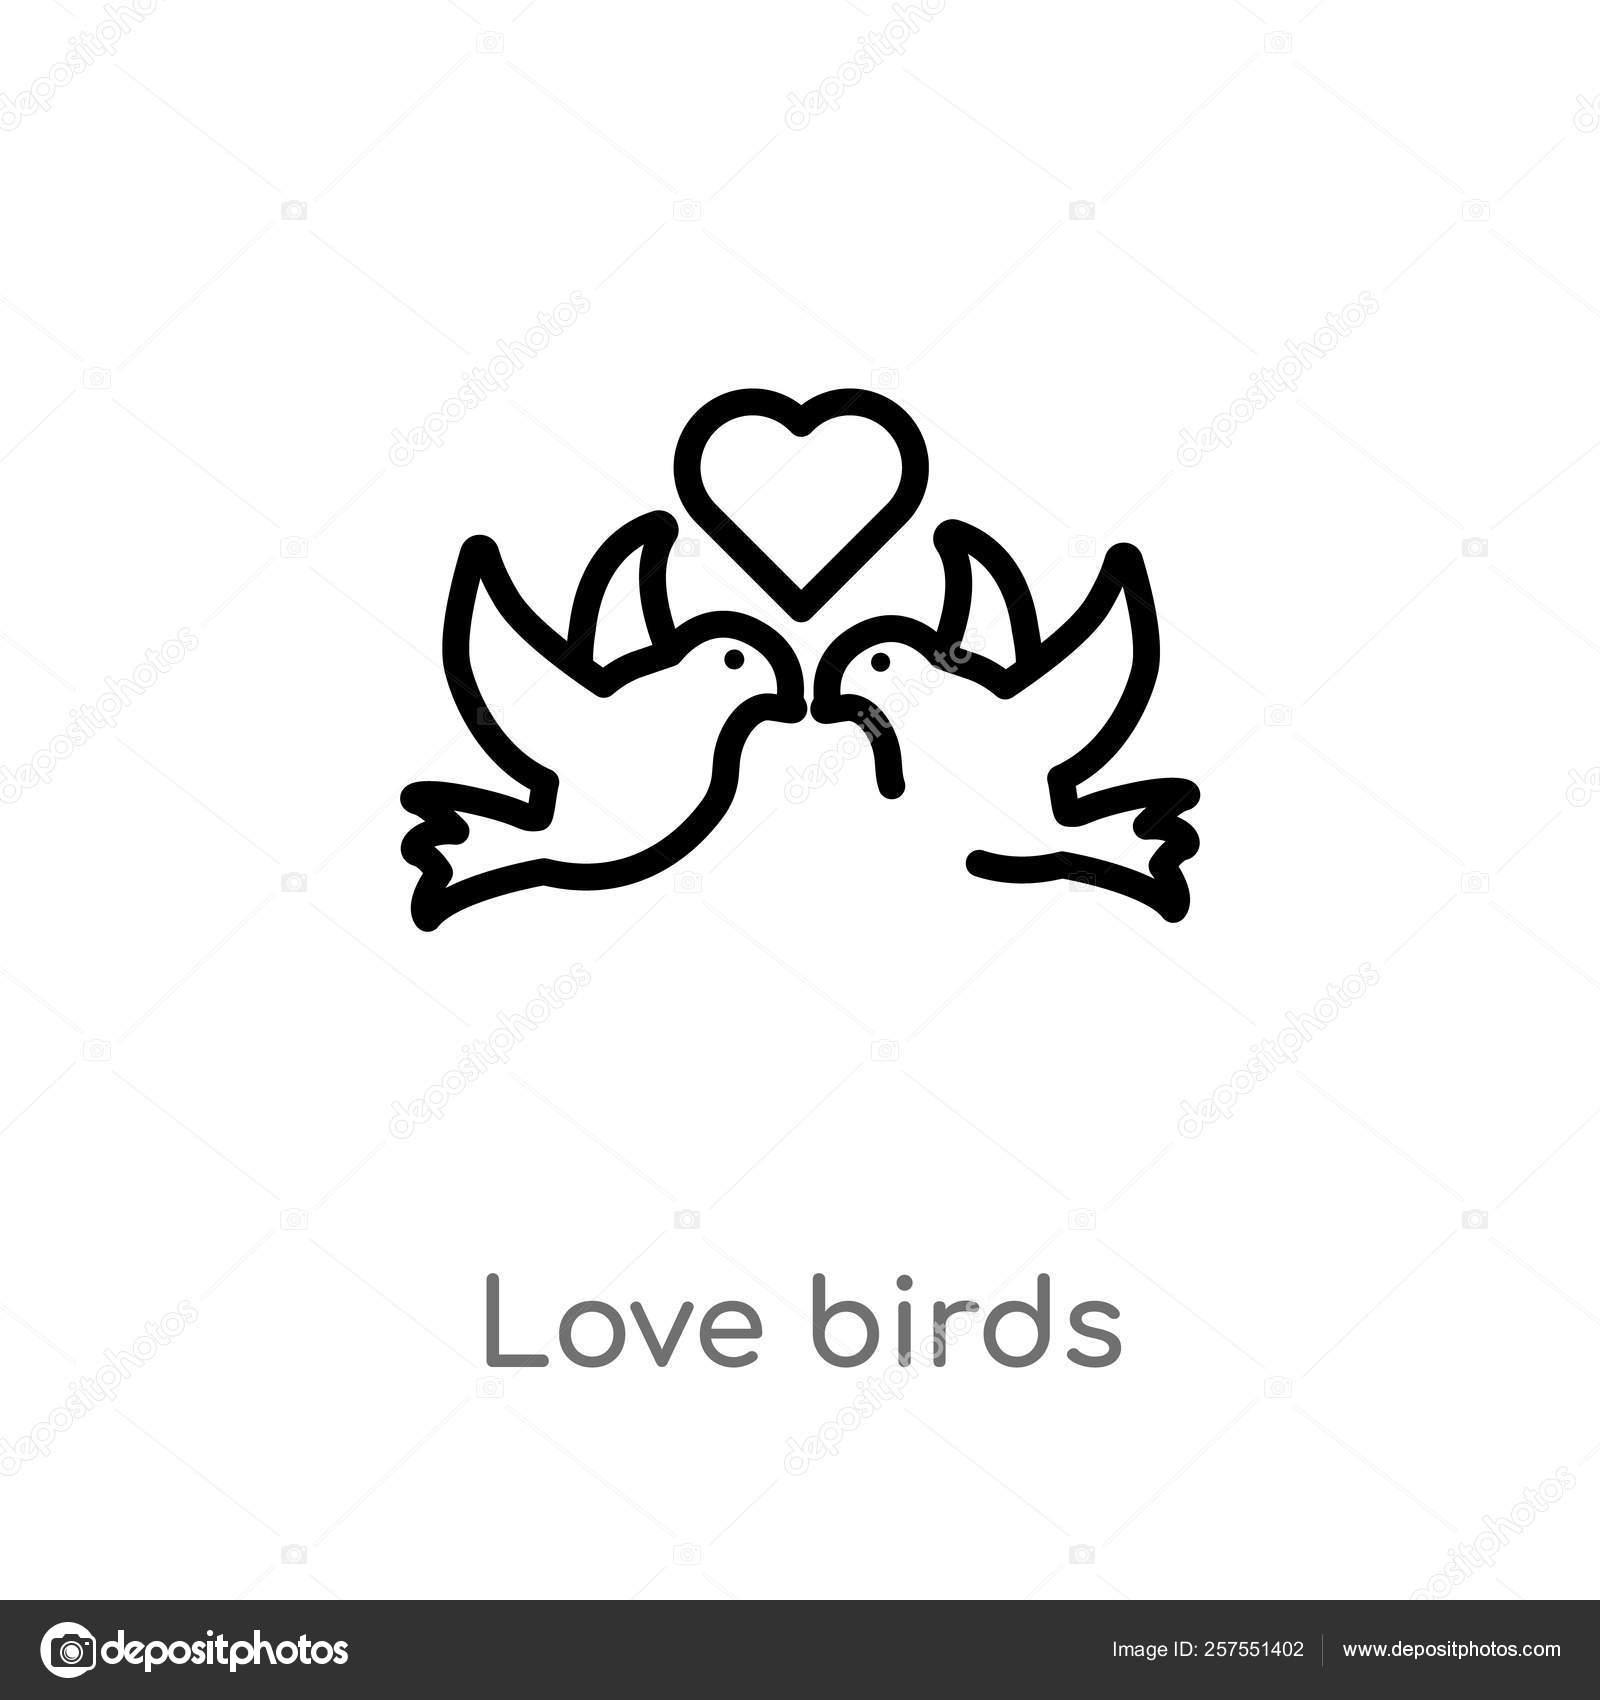 Outline Love Birds Vector Icon Isolated Black Simple Line Element Stock Vector C Zaurrahimov 257551402